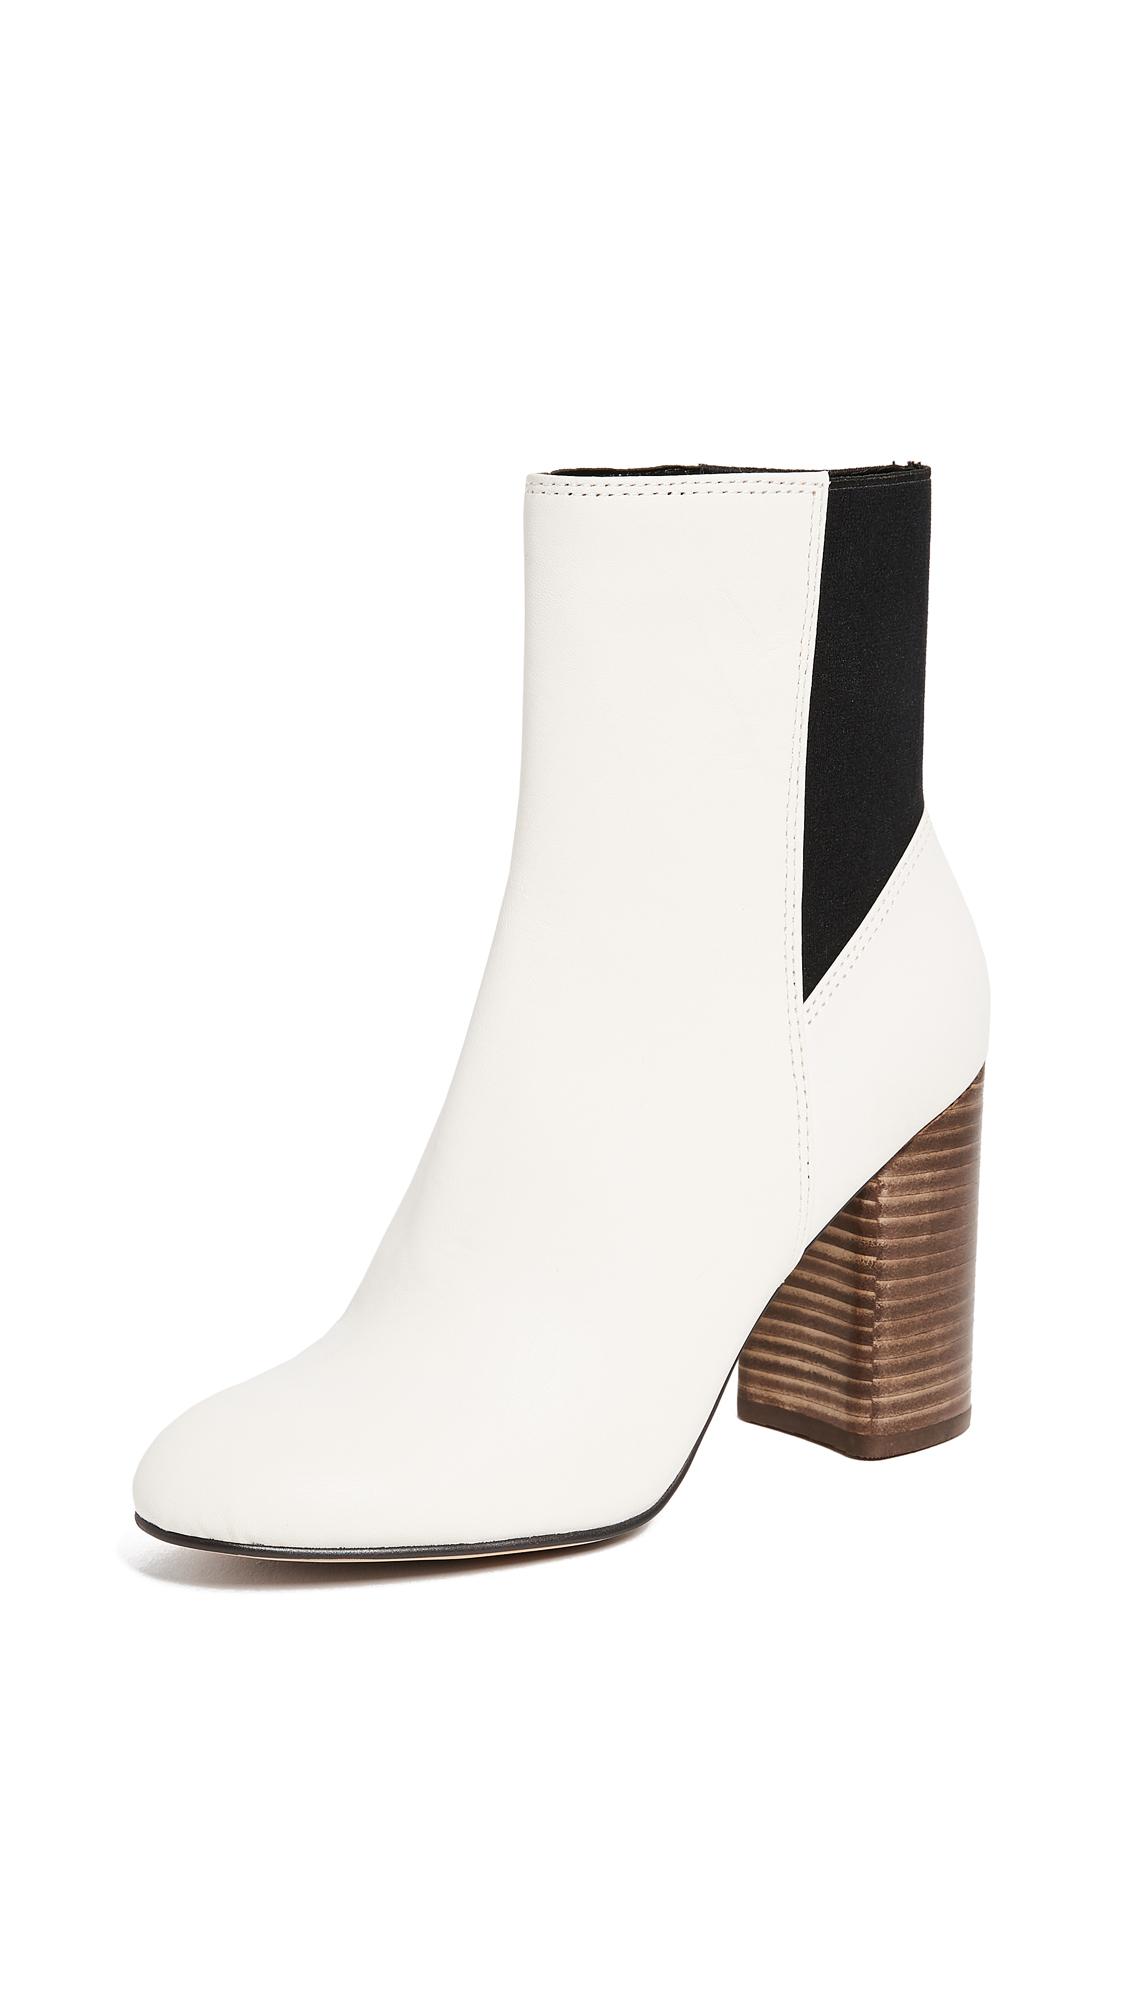 Dolce Vita Ramona Block Heel Ankle Boots - Ivory